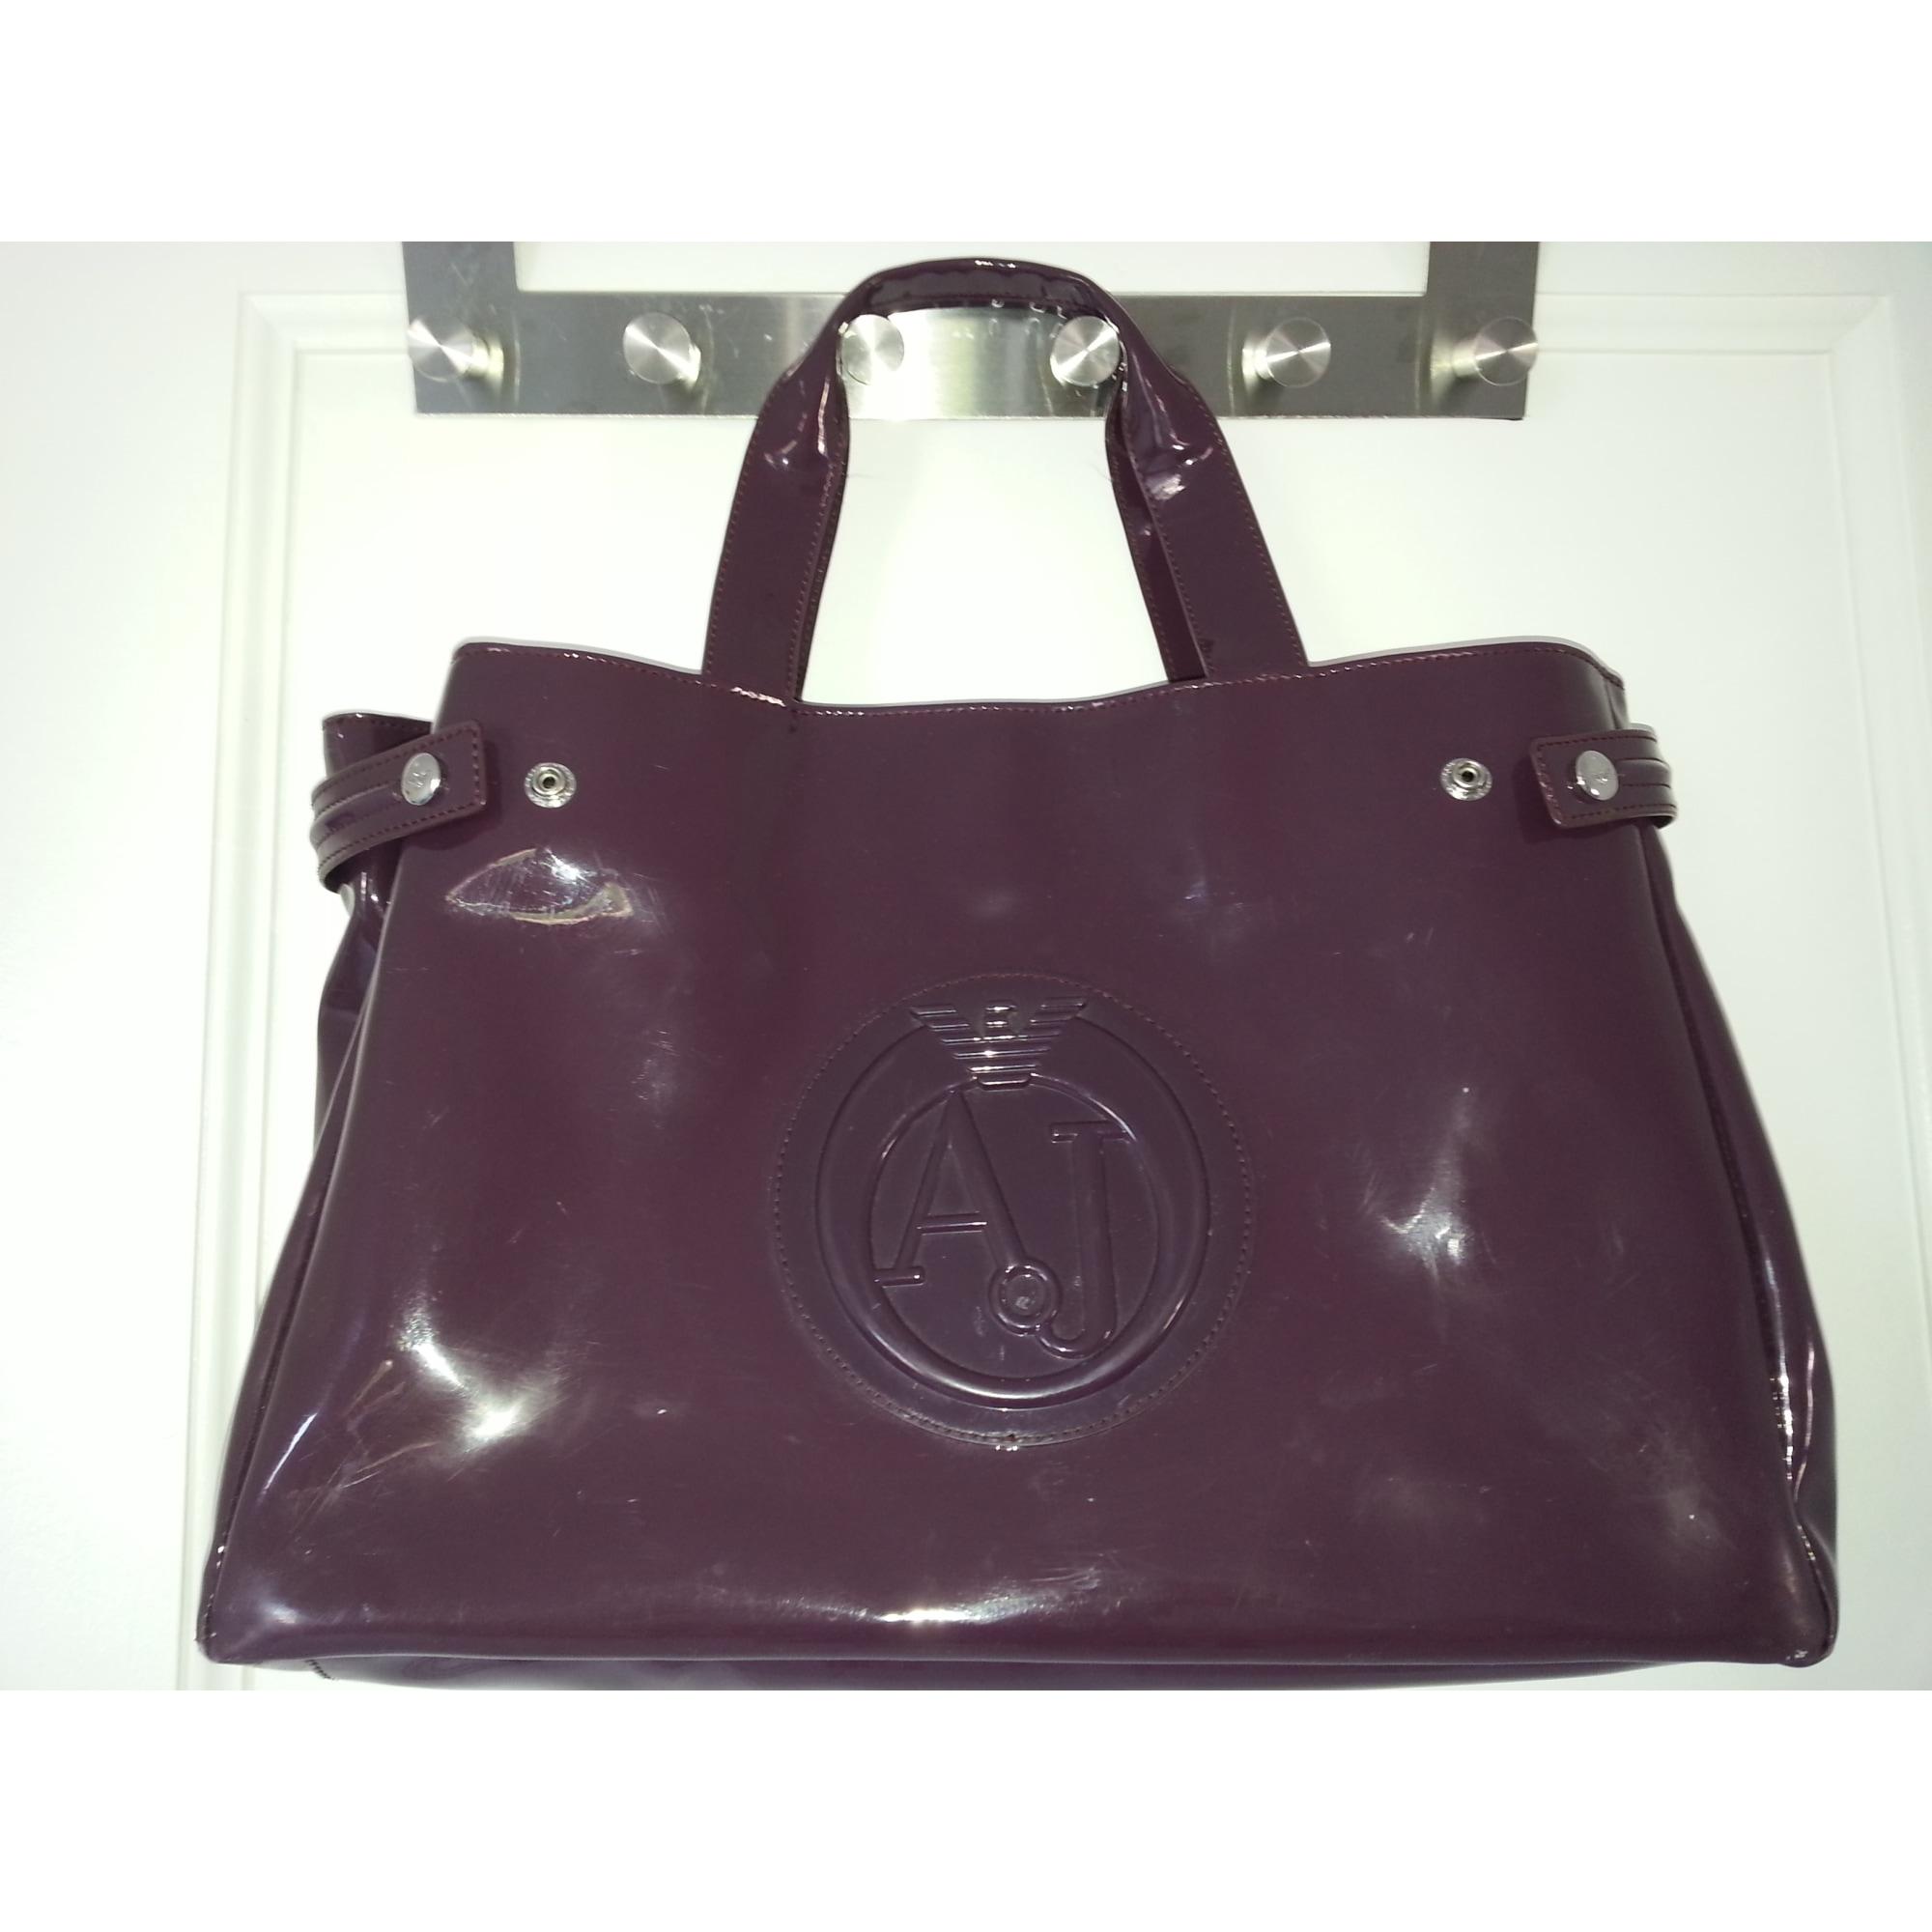 b82989d9a51 Sac à main en tissu ARMANI JEANS violet - 1664985